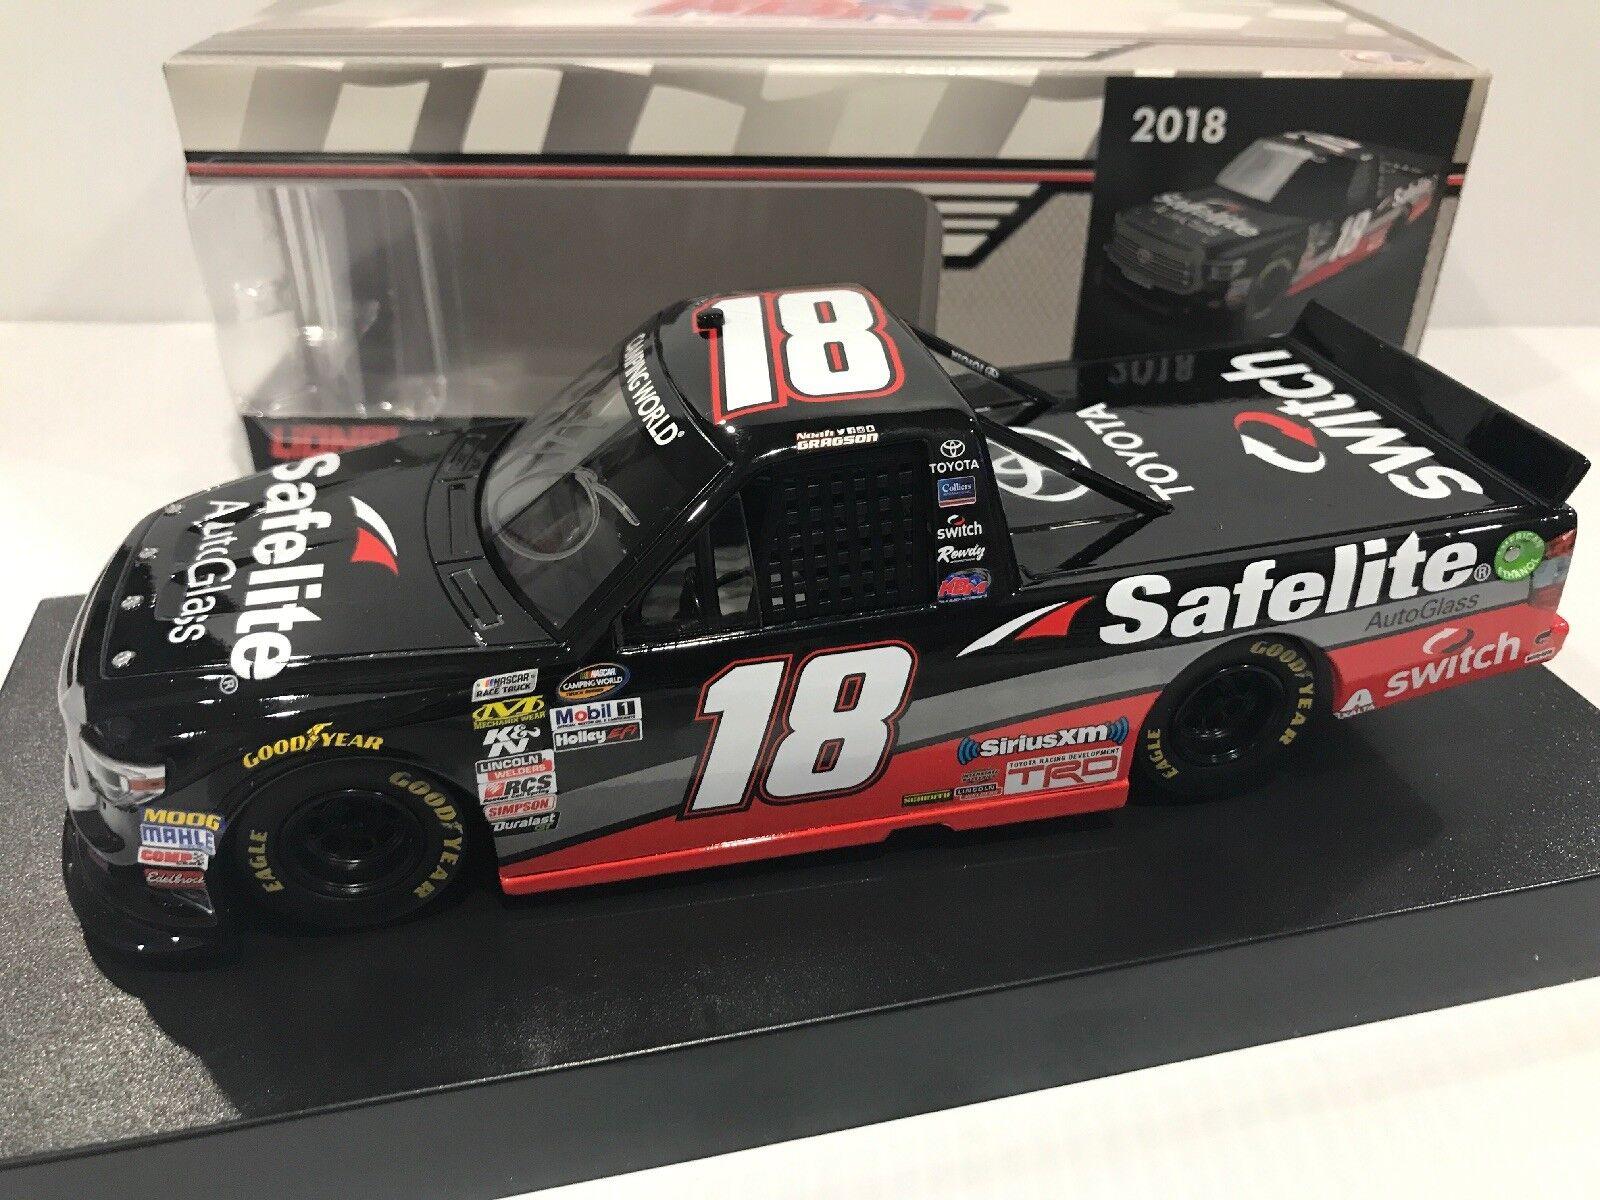 2018 Noah gragson SAFELITE KBM  18 Toyota Tacoma dédicacé 1 203